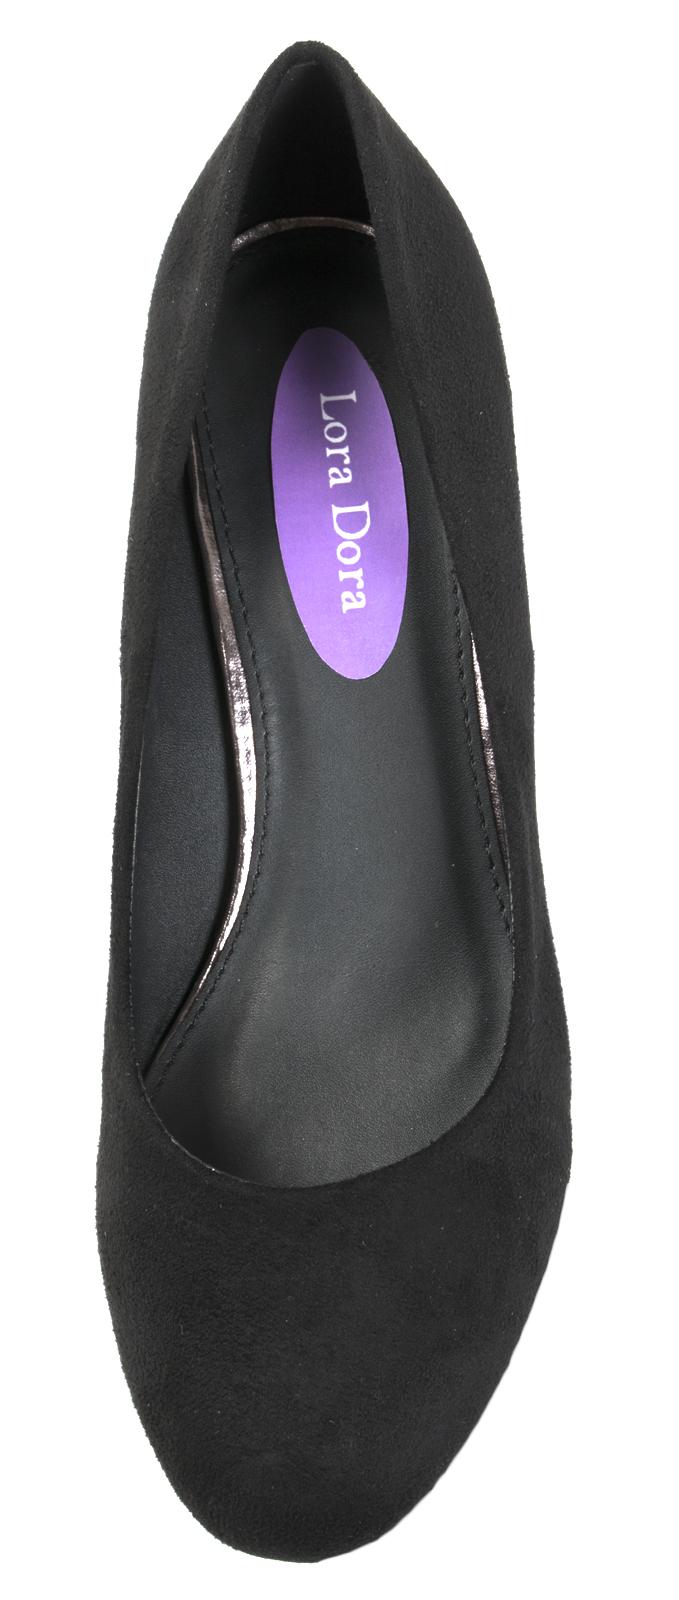 Ladies-Leather-Lined-Low-Block-Heels-Comfort-Work-Office-Court-Shoes-Ladies-Size miniatuur 11